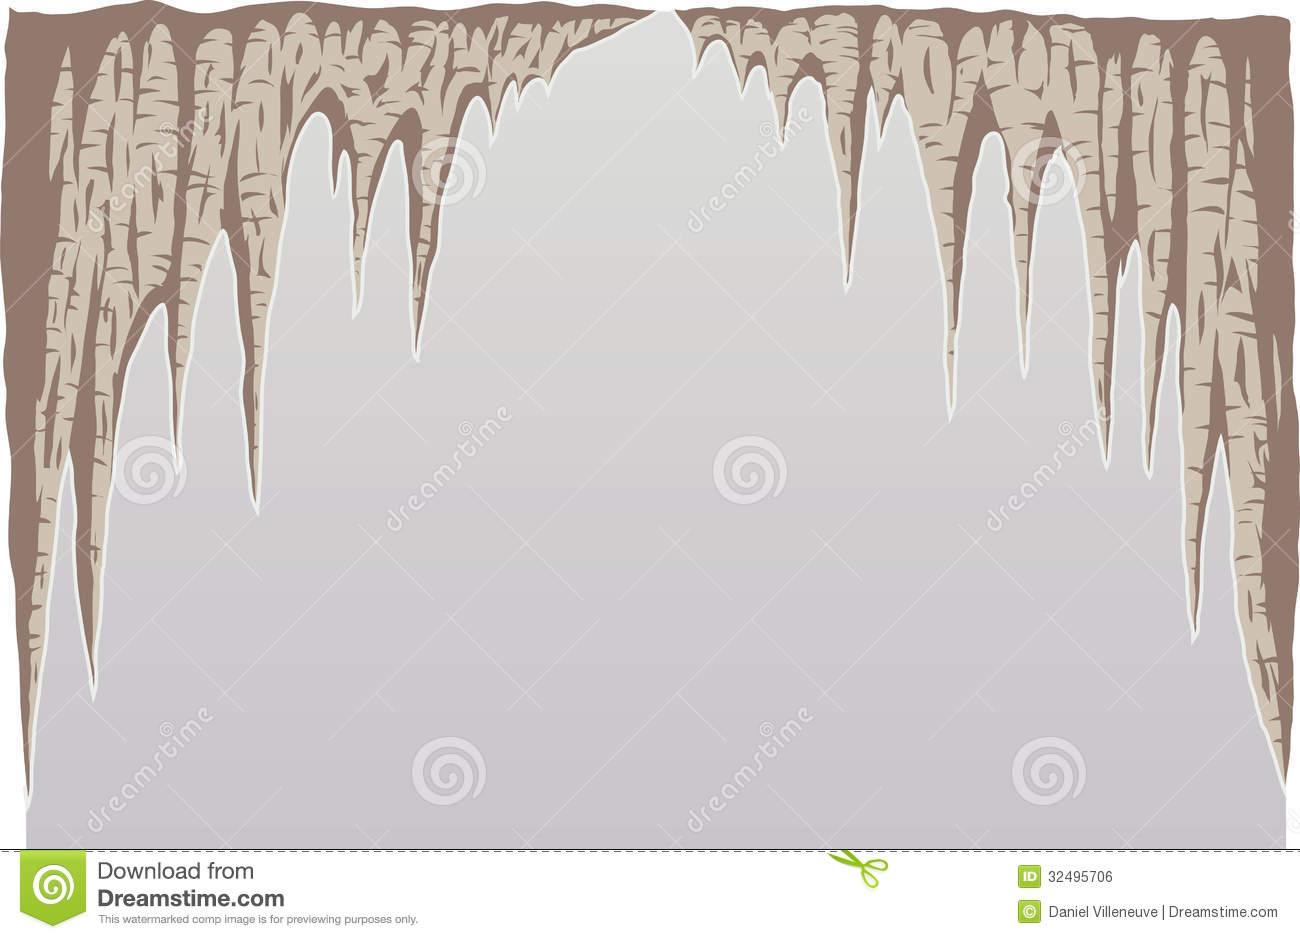 stalagmites clipart